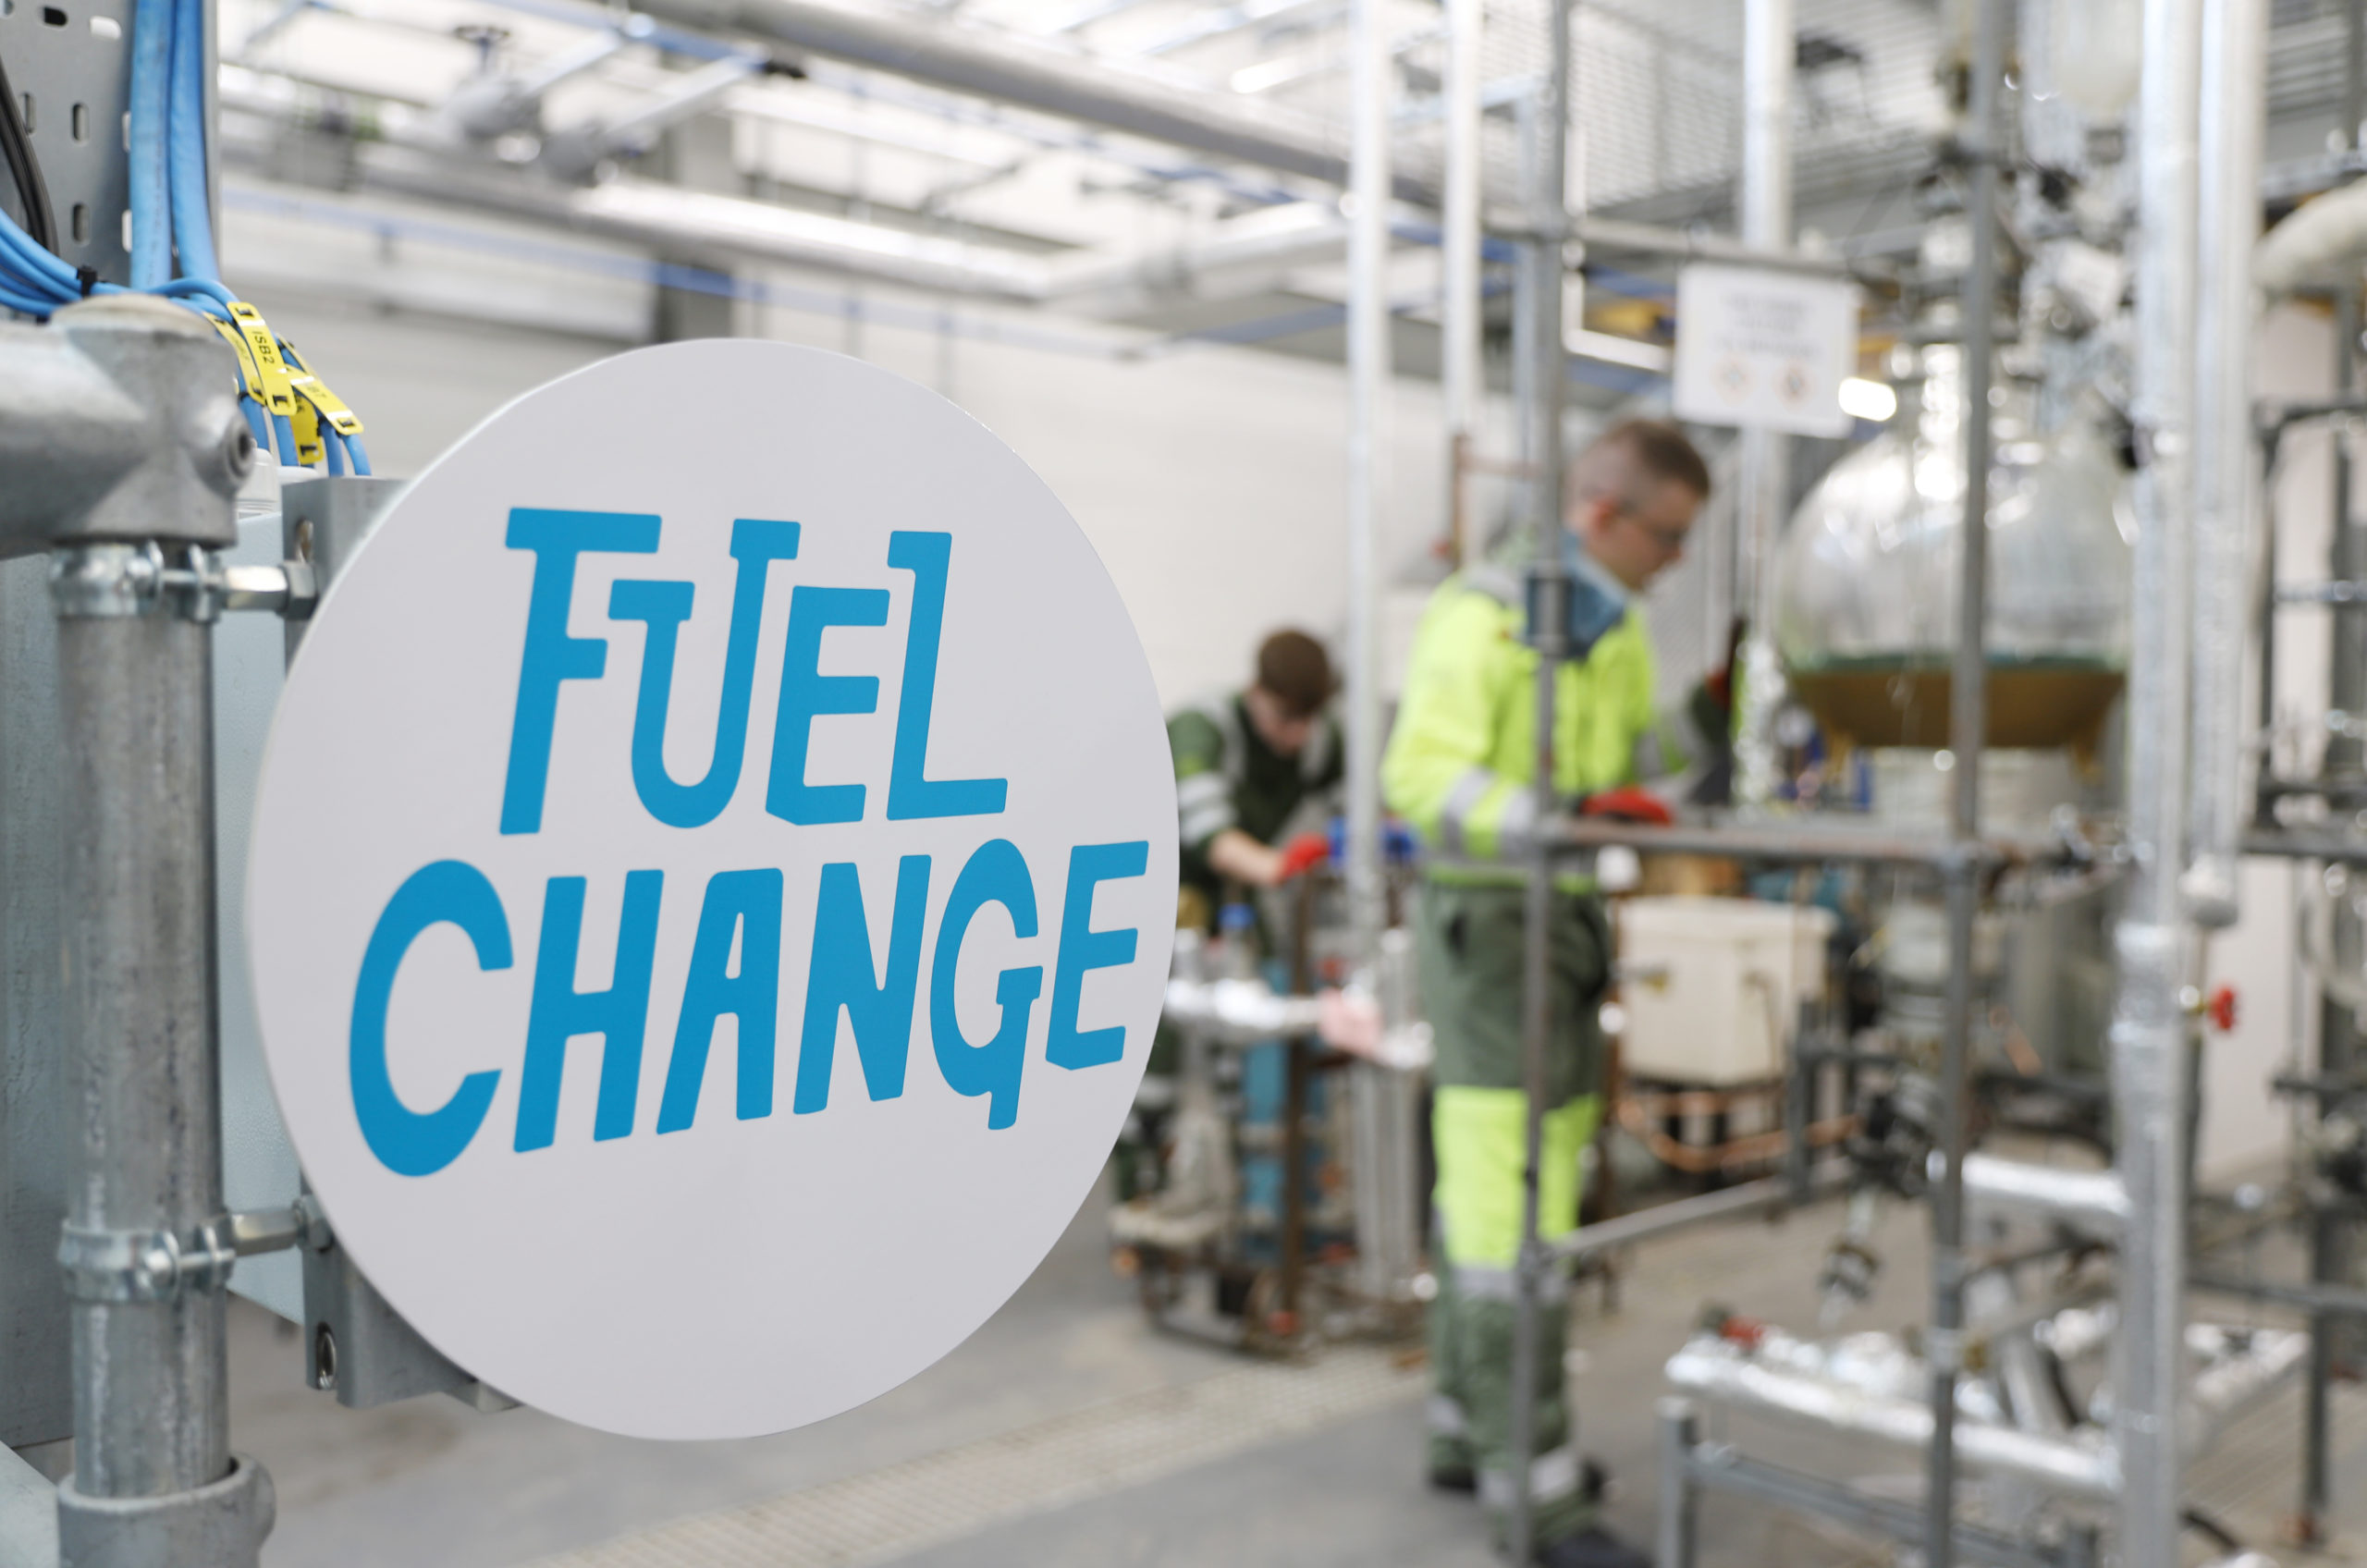 Apprentice talent to Fuel Change for a low carbon Scotland